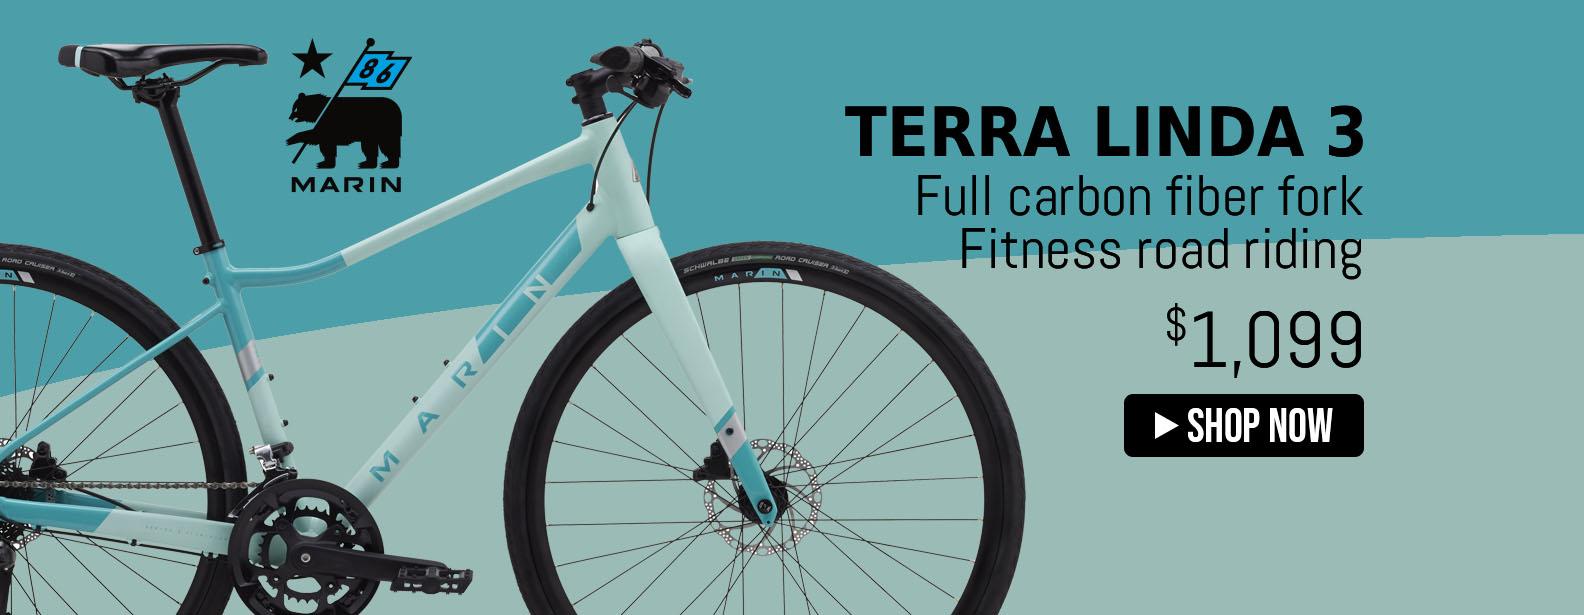 Marin Terra Linda 3 Bike